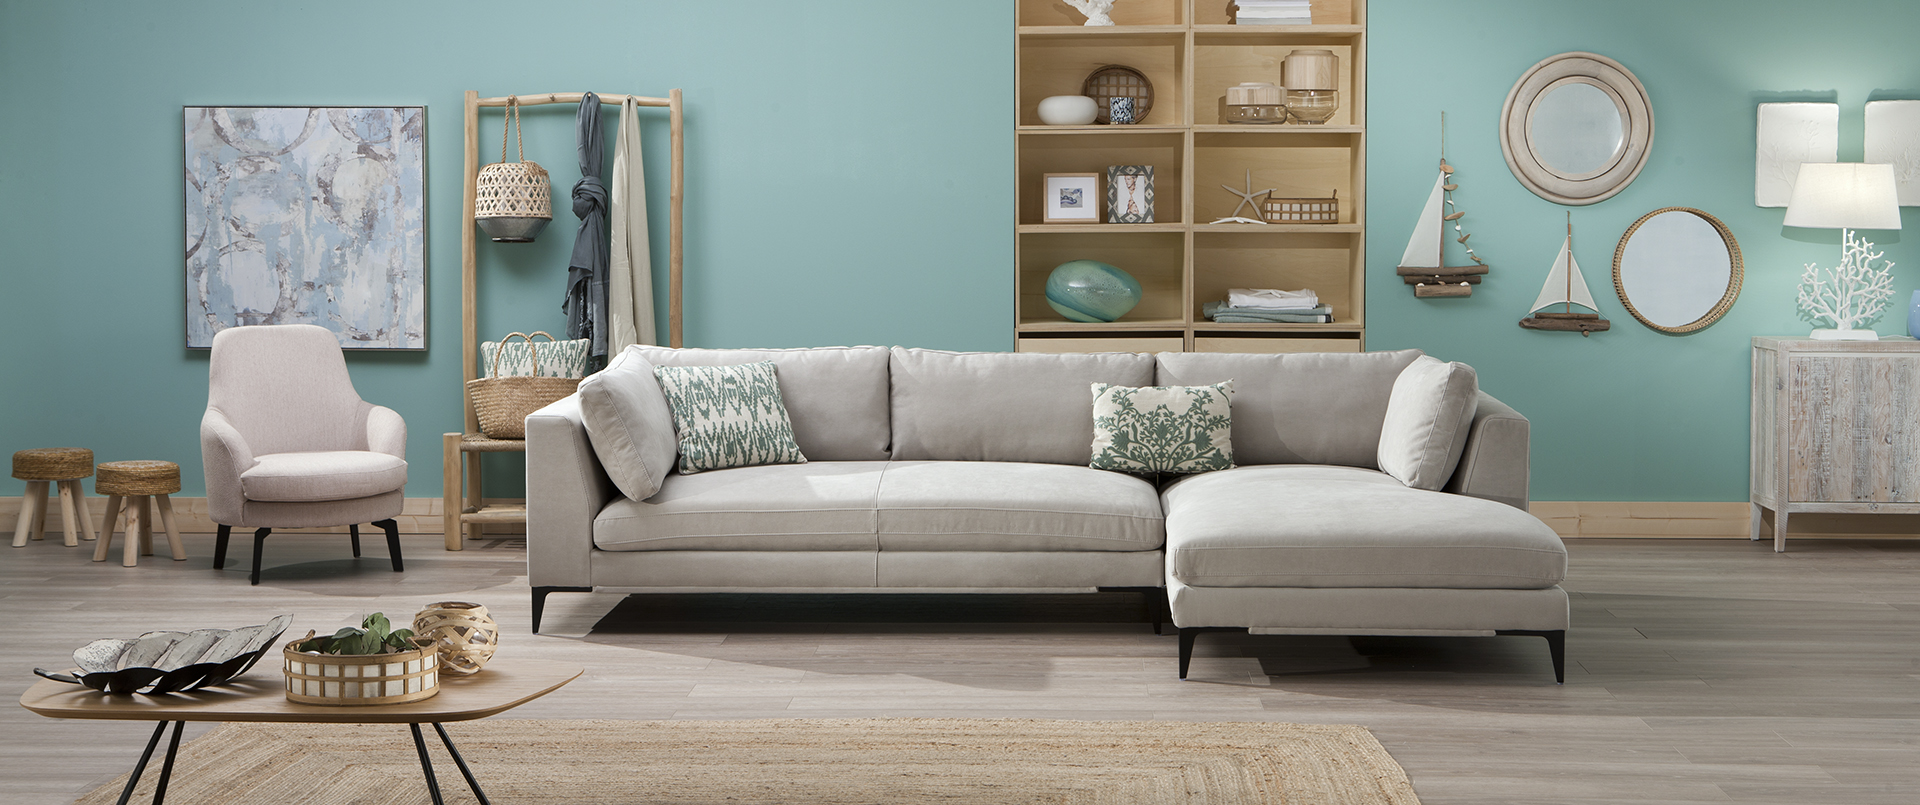 Sofa Chaise Long Beige Weekend